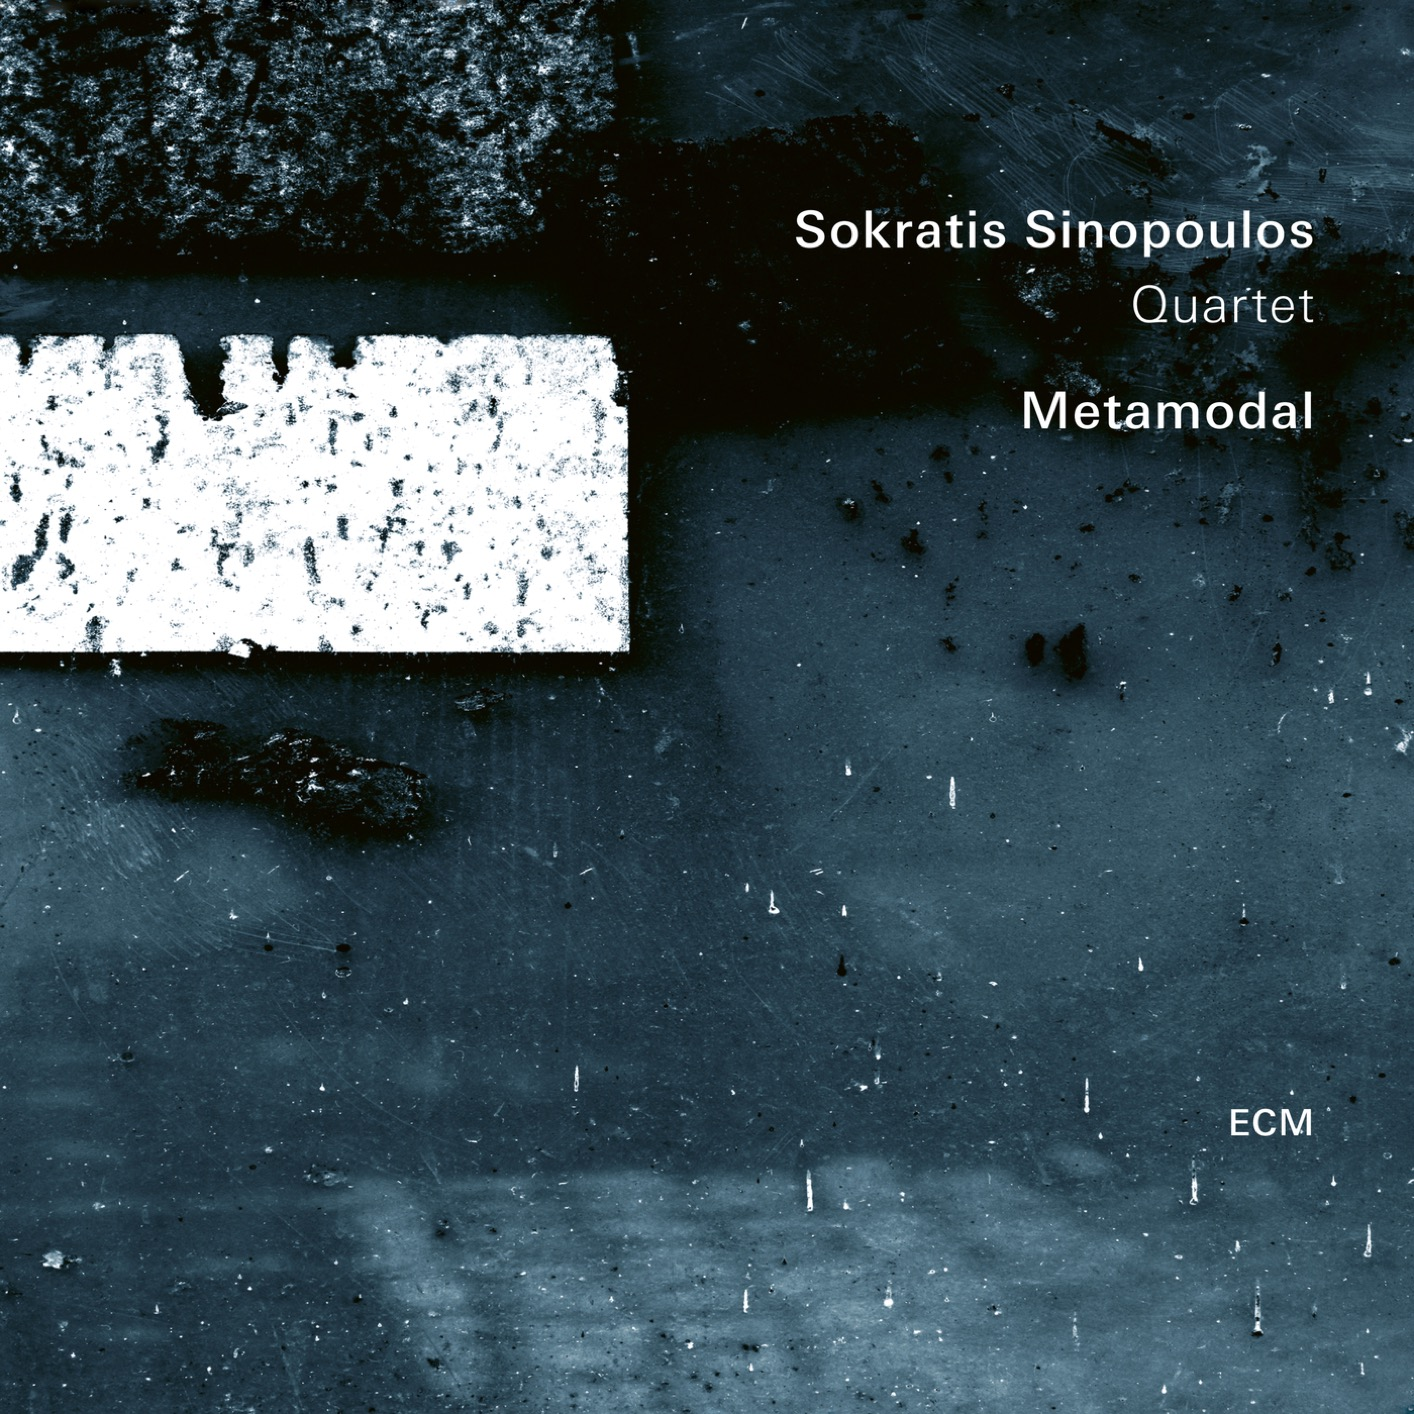 Sokratis Sinopoulos Quartet - Metamodal (2019) [Official Digital Download 24/96]